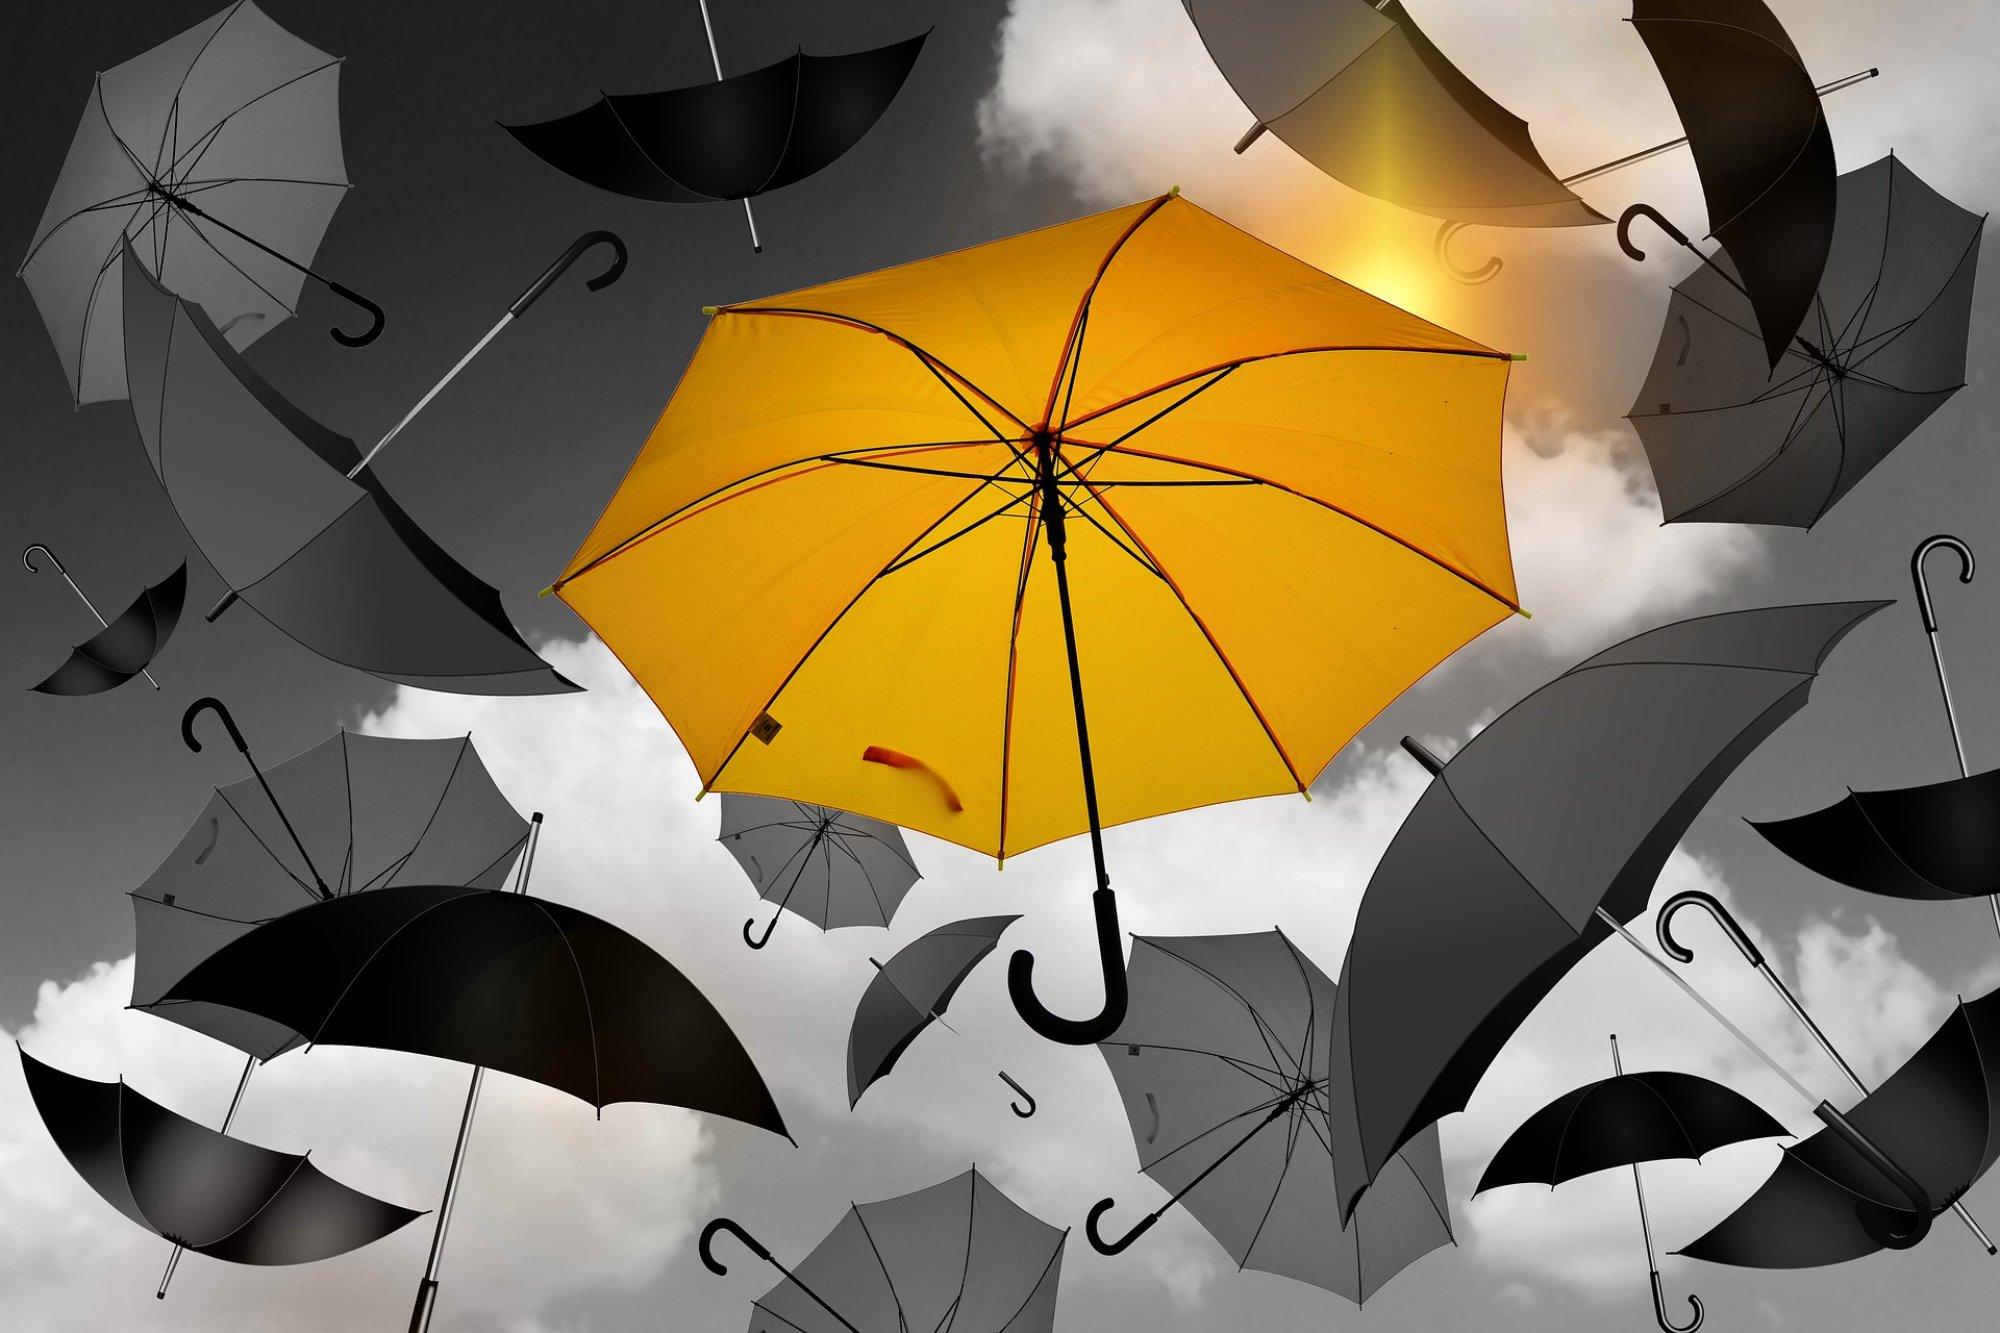 yellow umbrella.jpg